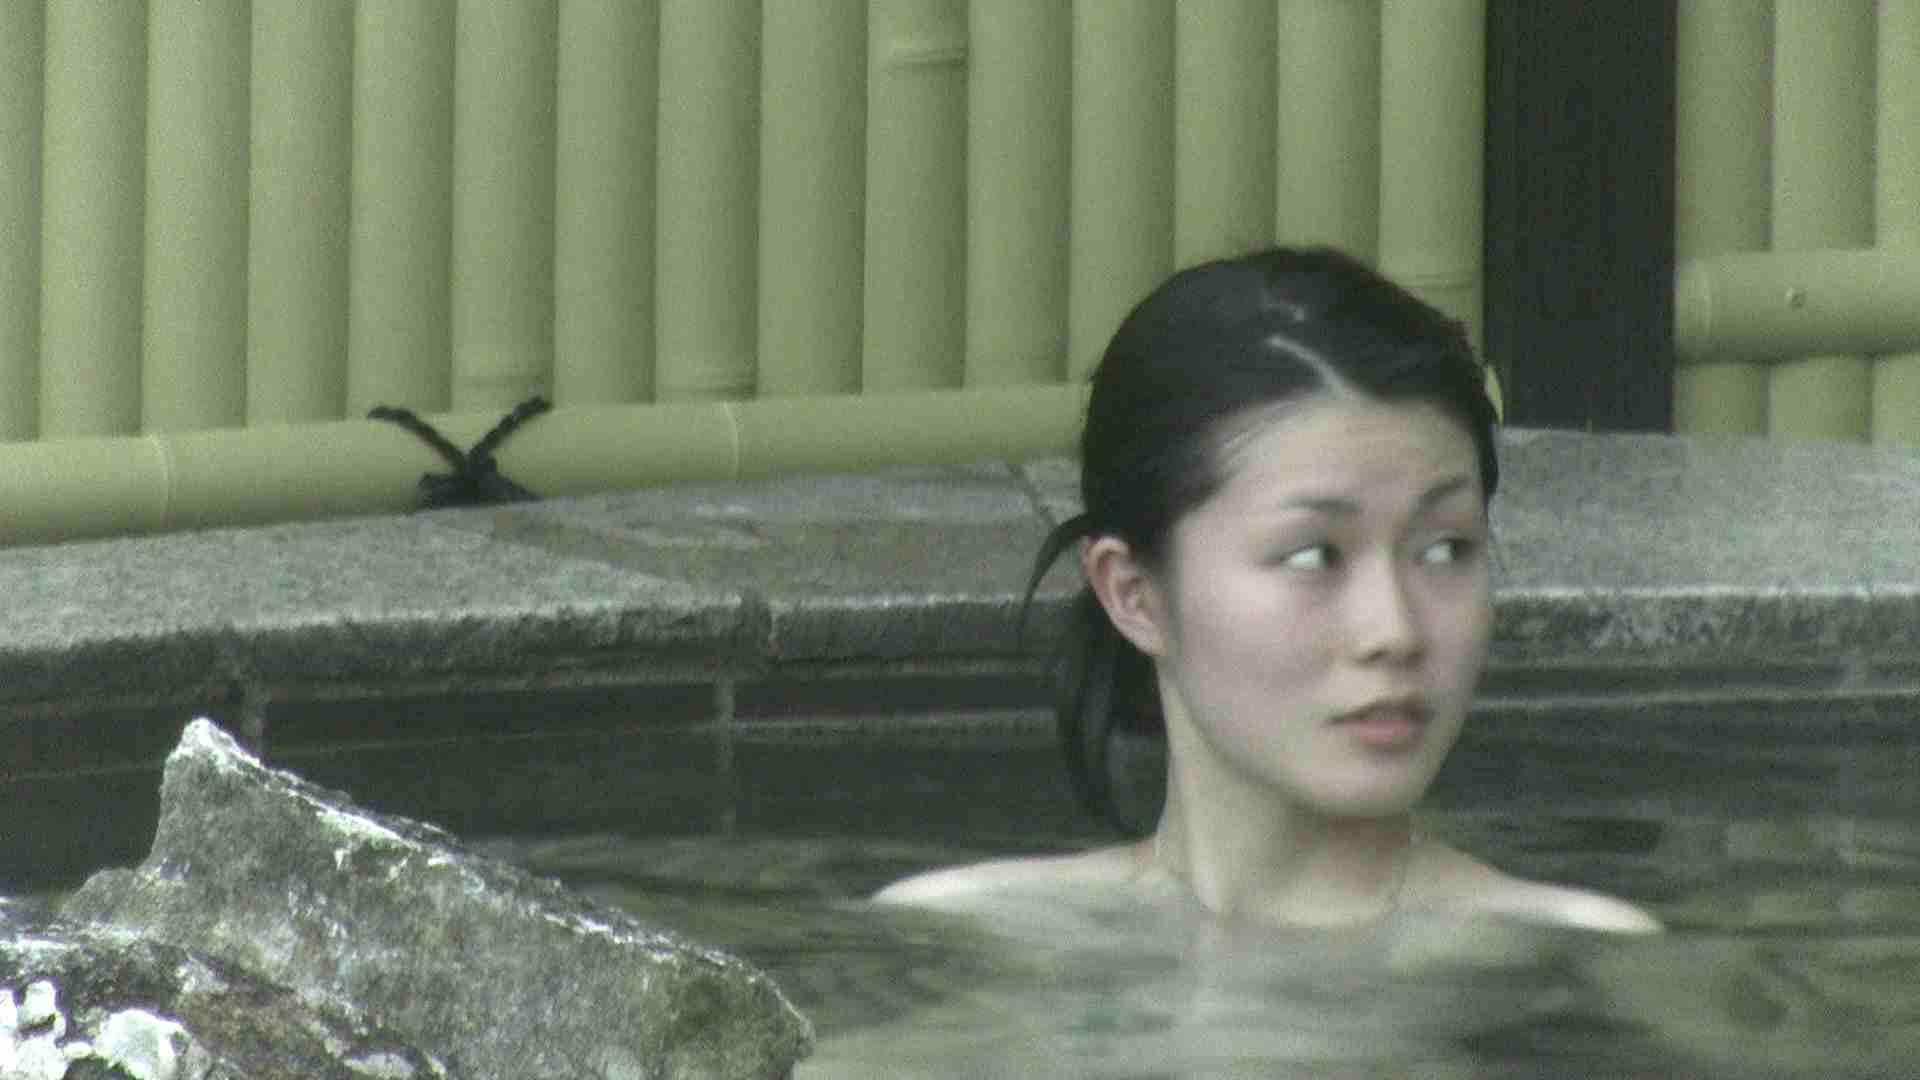 Aquaな露天風呂Vol.194 露天風呂編  110PIX 54